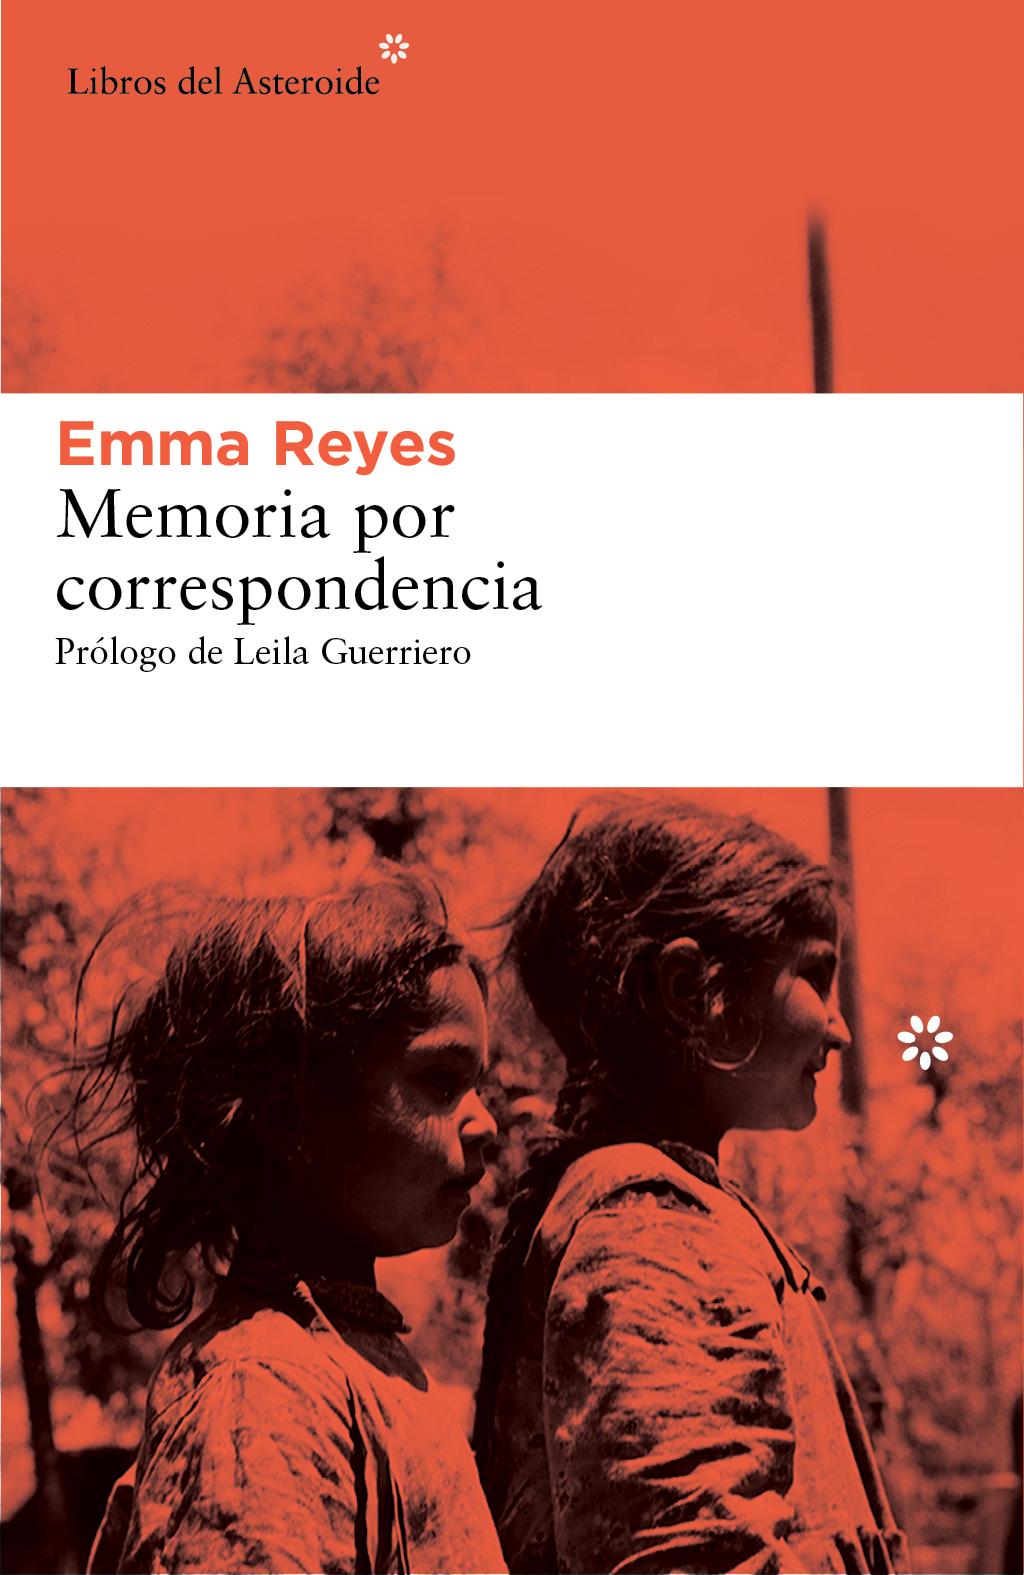 Emma Reyes, un triste testimonio - Libertad Digital - Cultura